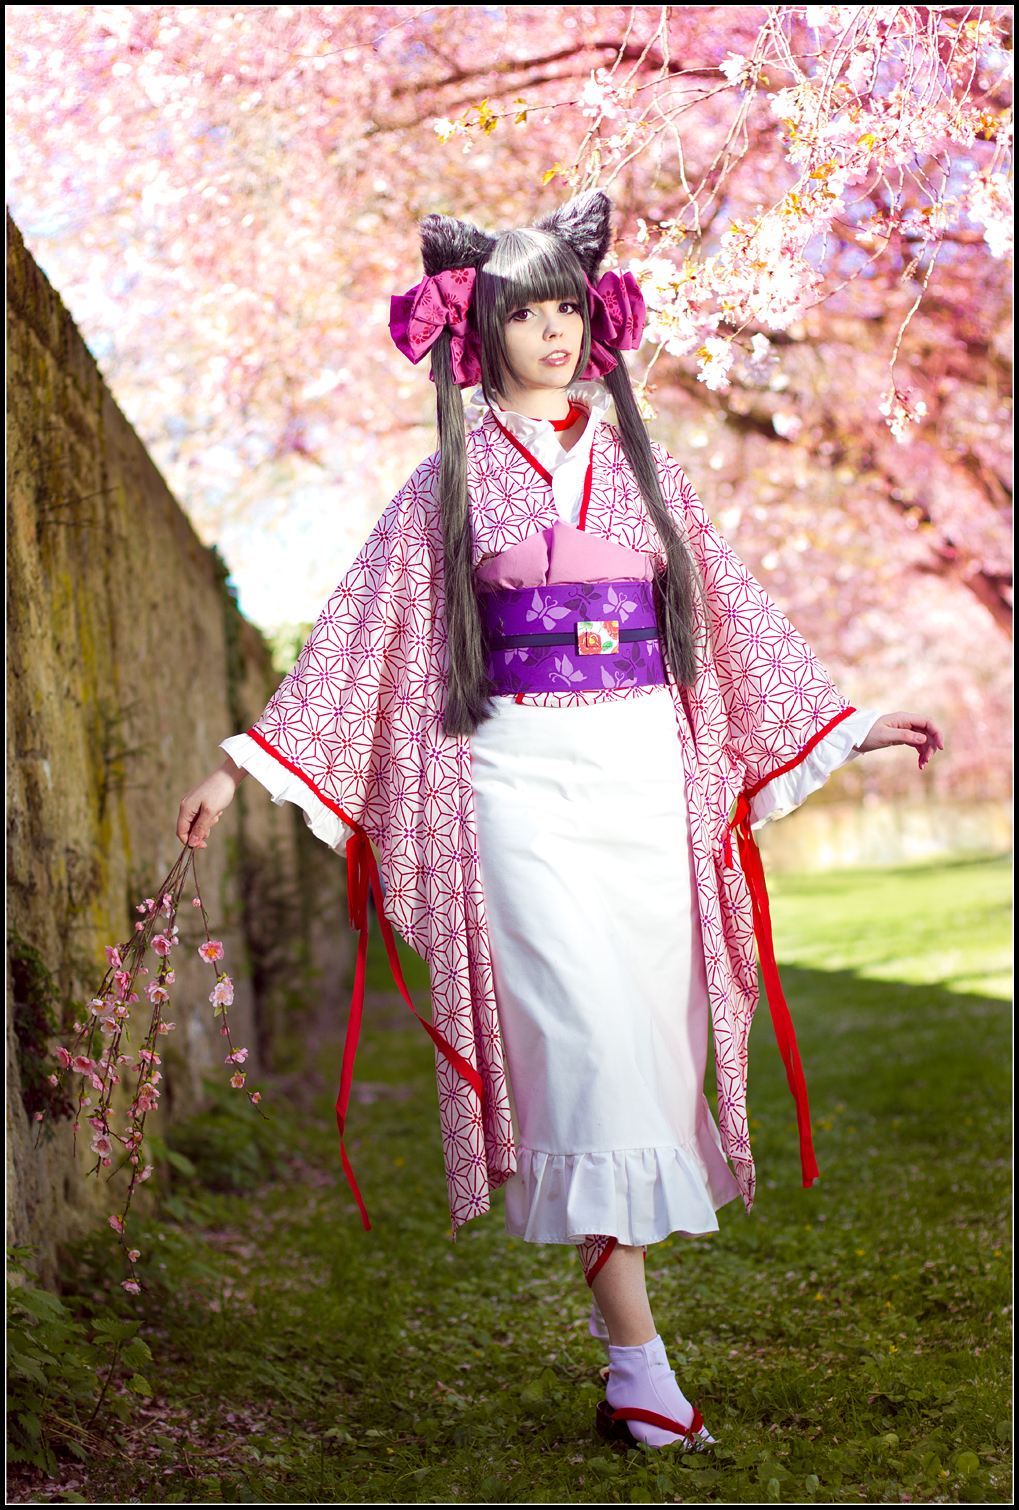 Otome Youkai Zakuro II by Calssara